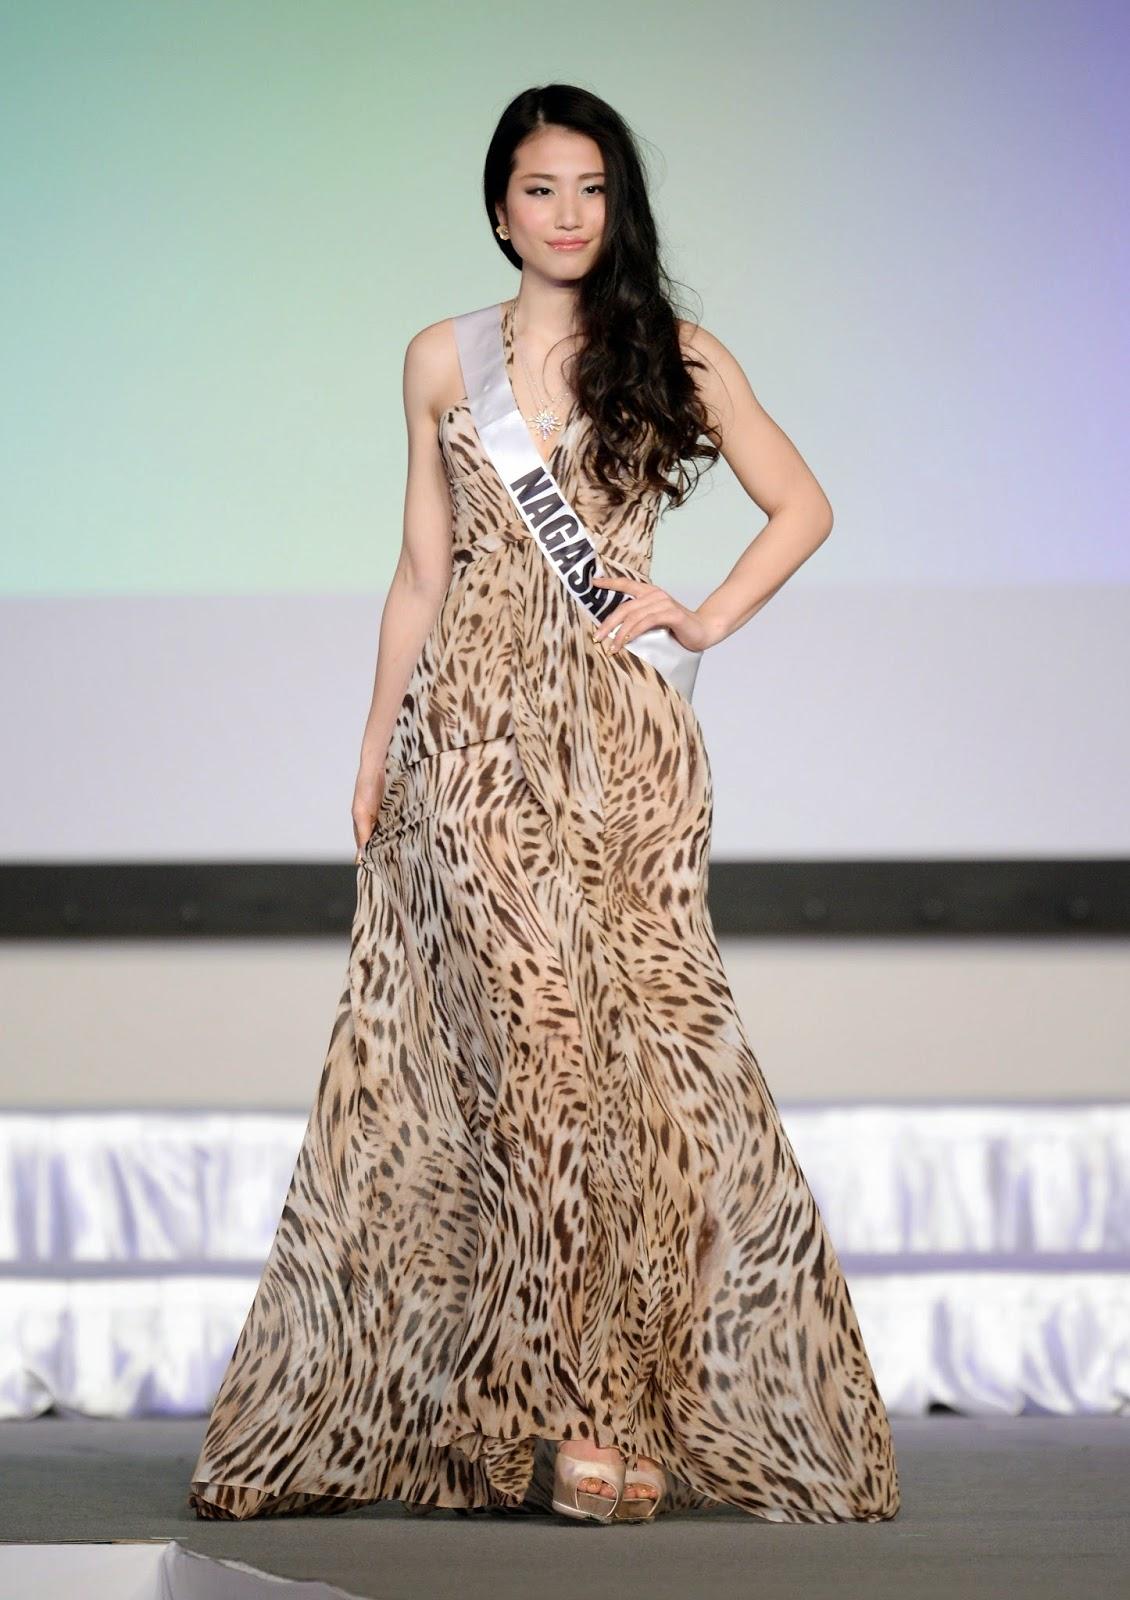 Beauty, Beauty Pageant, College Girl, Crowned, Japan, Japan Beauty Pageant, Keiko Tsuji, Miss Universe 2014, Tokyo, Winner of Miss Japan,